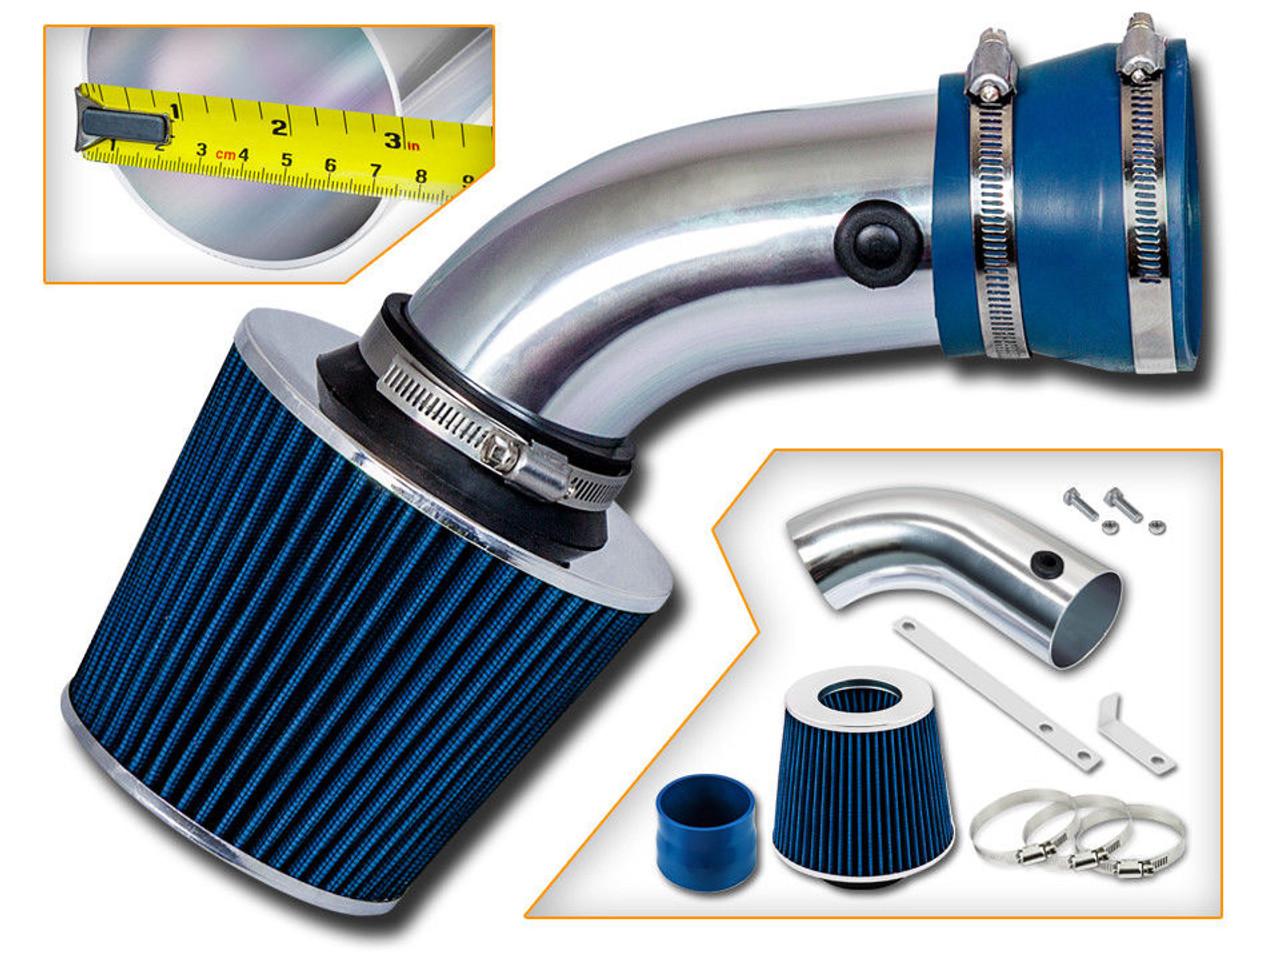 BLUE AIR INTAKE KIT FIT 2001-2003 FORD EXPLORER SPORT TRAC 4.0 4.0L V6